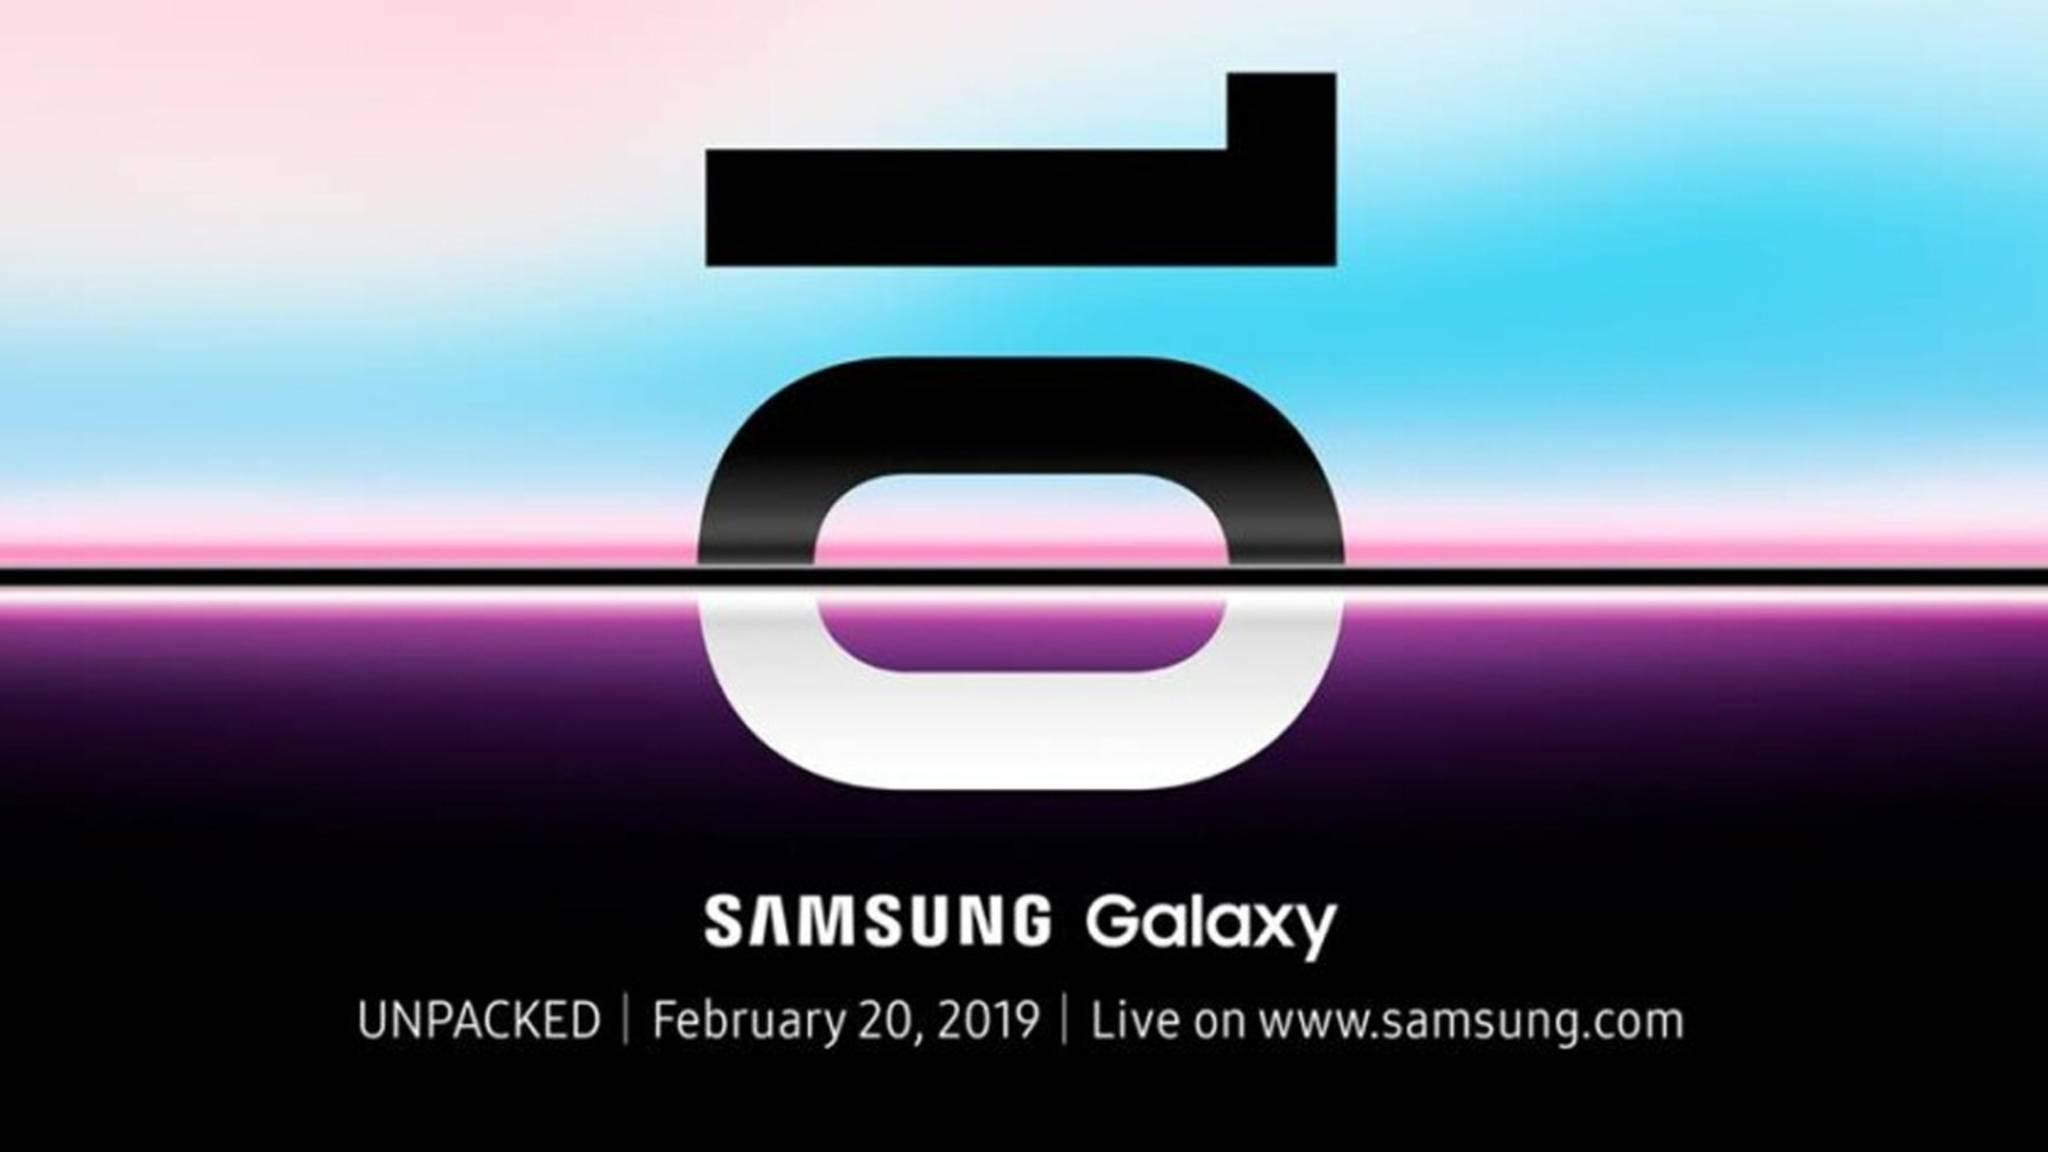 Am 20. Februar wird das Samsung Galaxy S10 enthüllt.